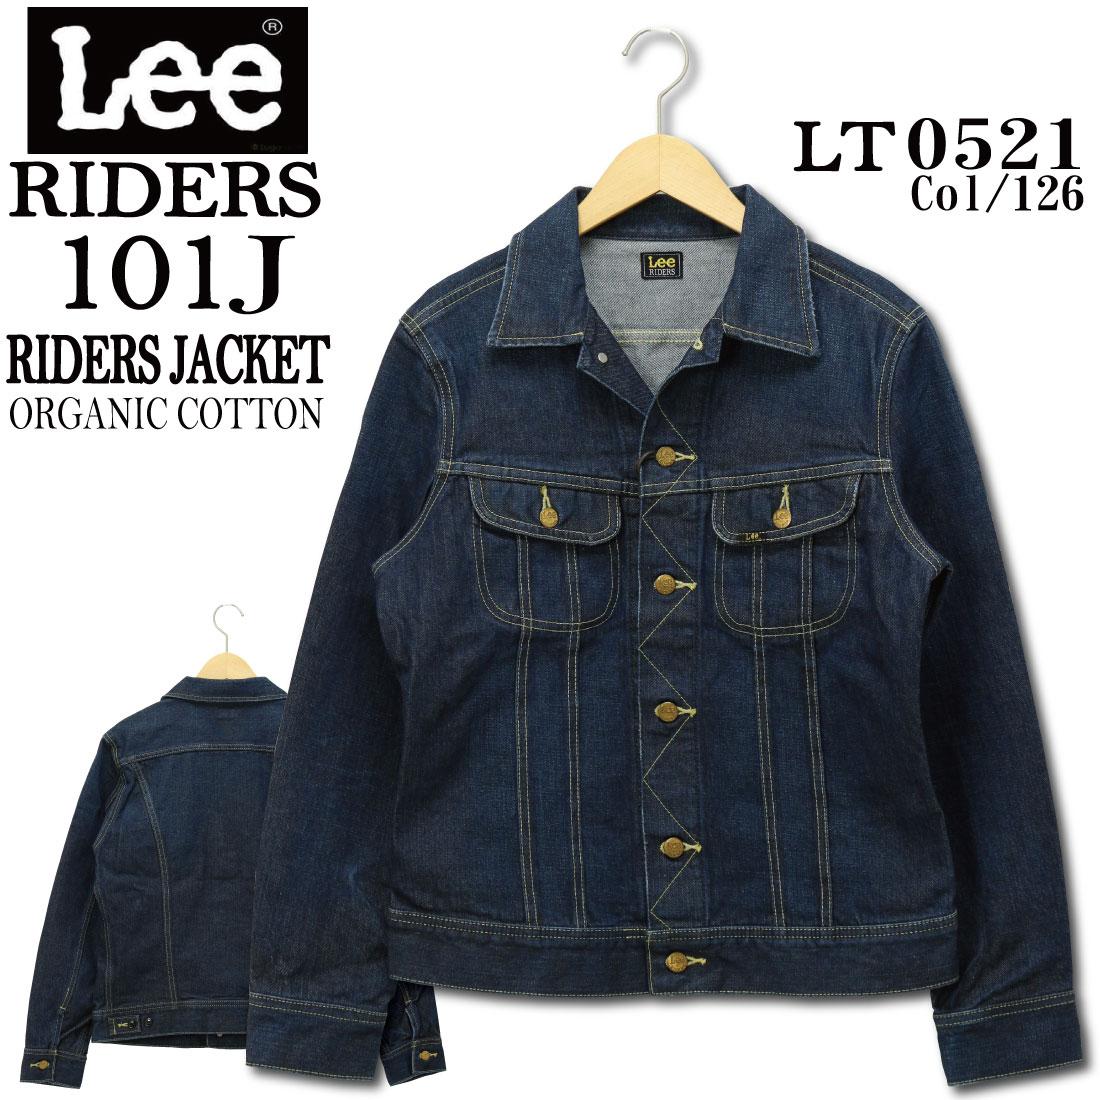 Lee リー 101J LT0521 ライダース ジャケット ジージャン Gジャン デニム ジャケット LT0521-126 メンズ